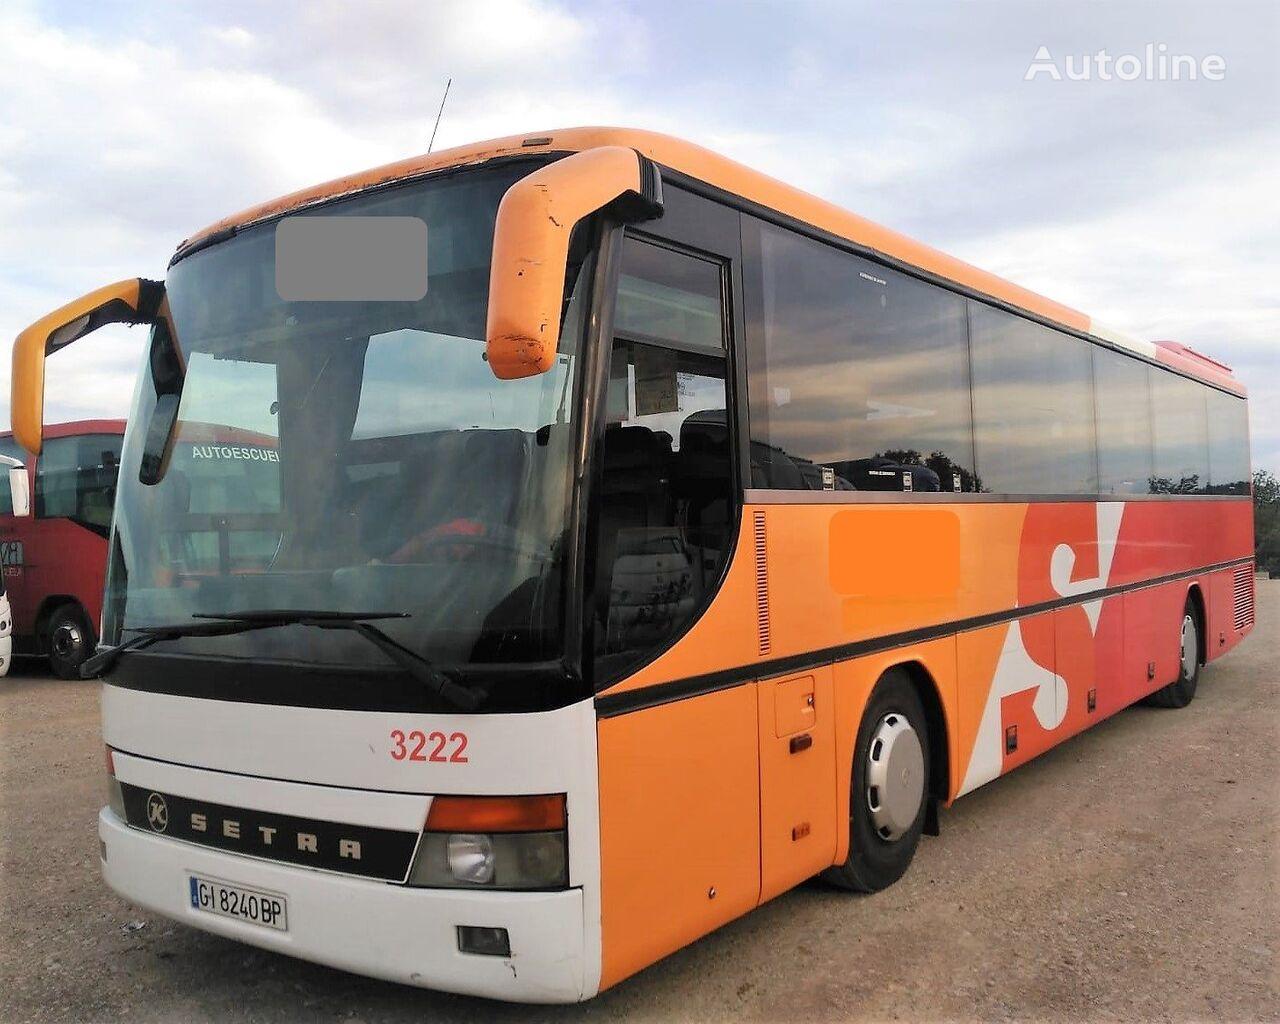 SETRA S315 GT  8 CILINDROS MOTOR MERCEDES+8CILI+380CV coach bus